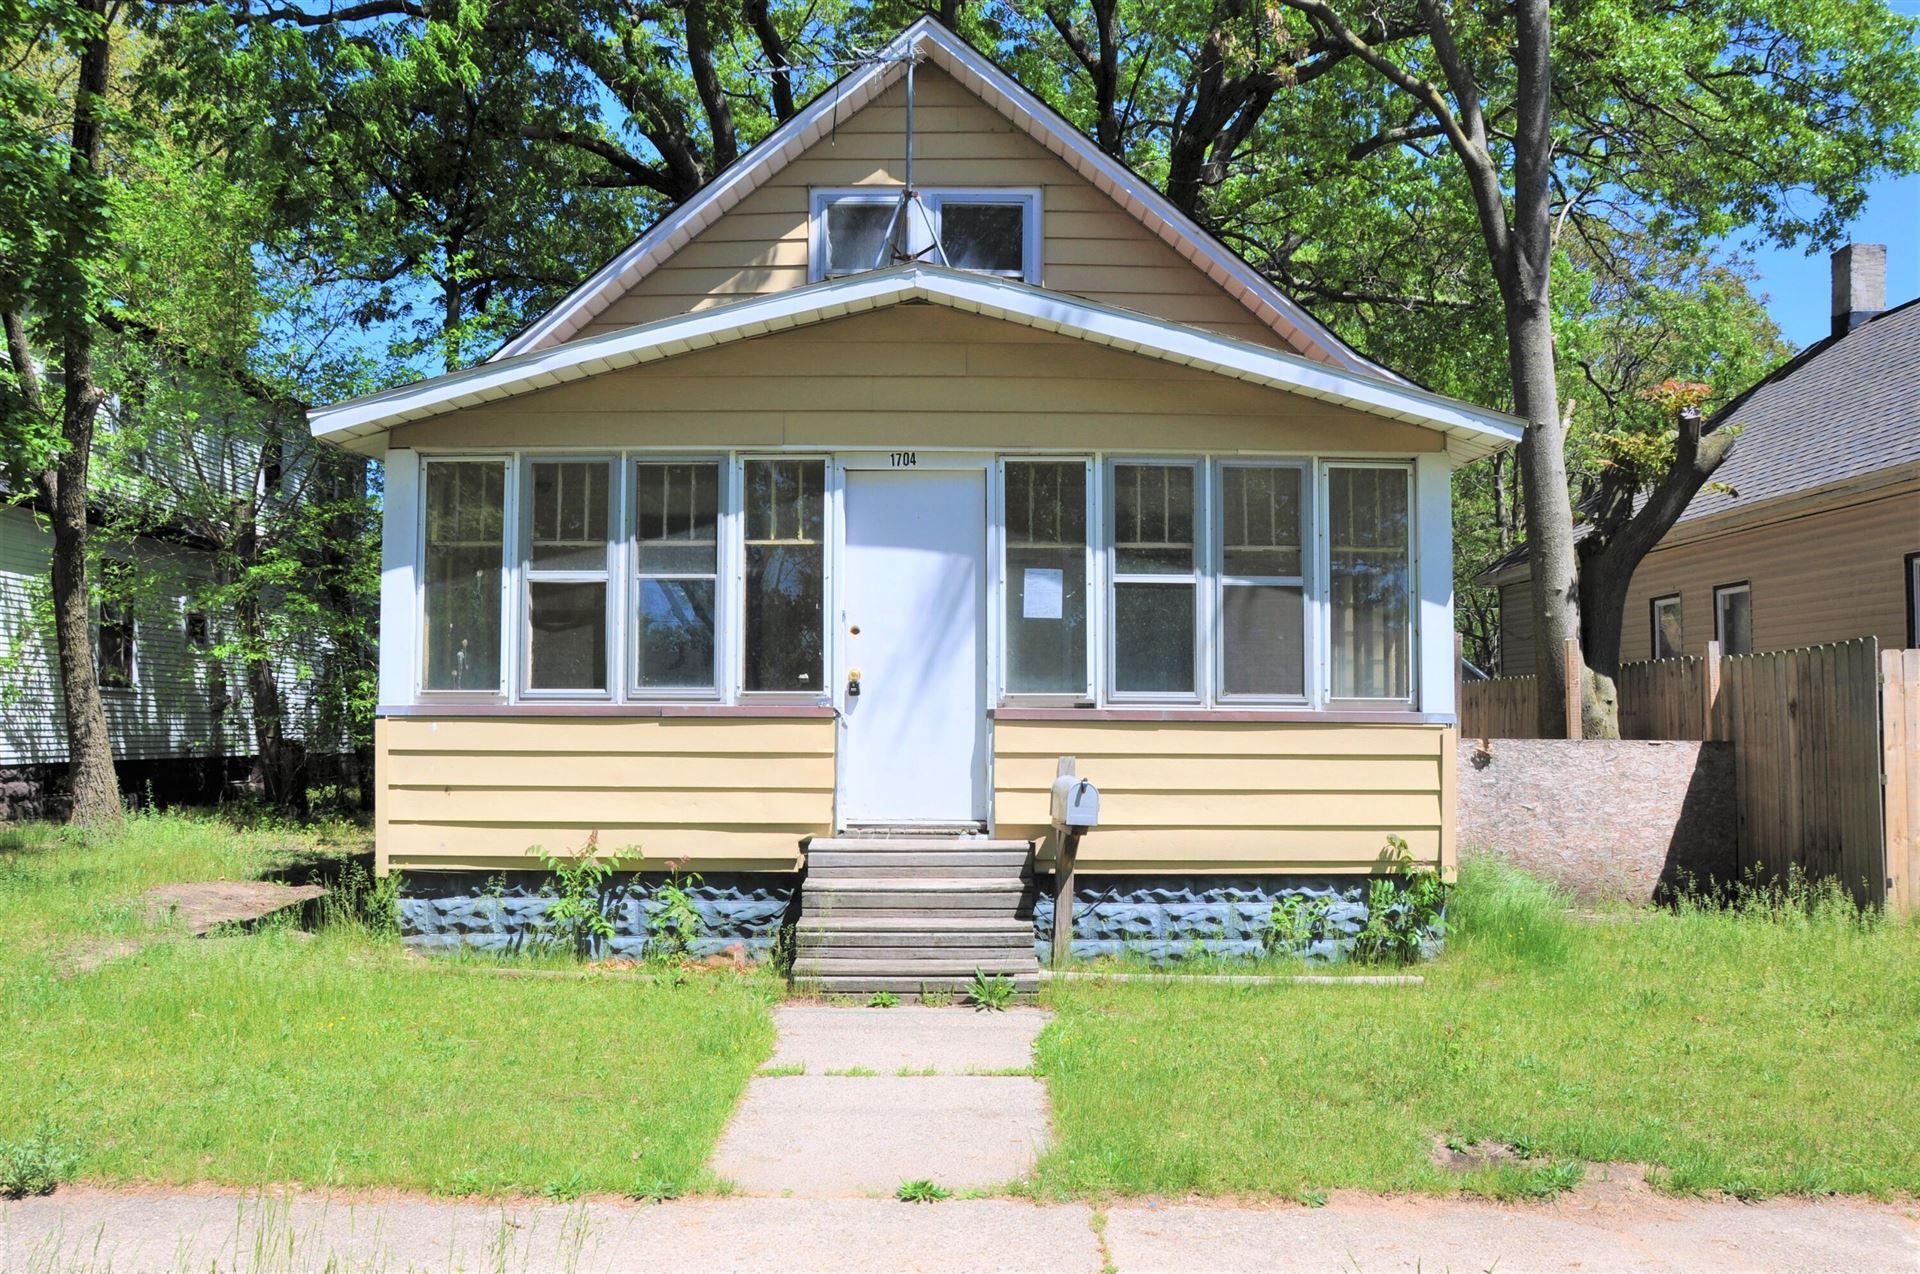 1704 Wood Street, Muskegon, MI 49442 - MLS#: 21020307